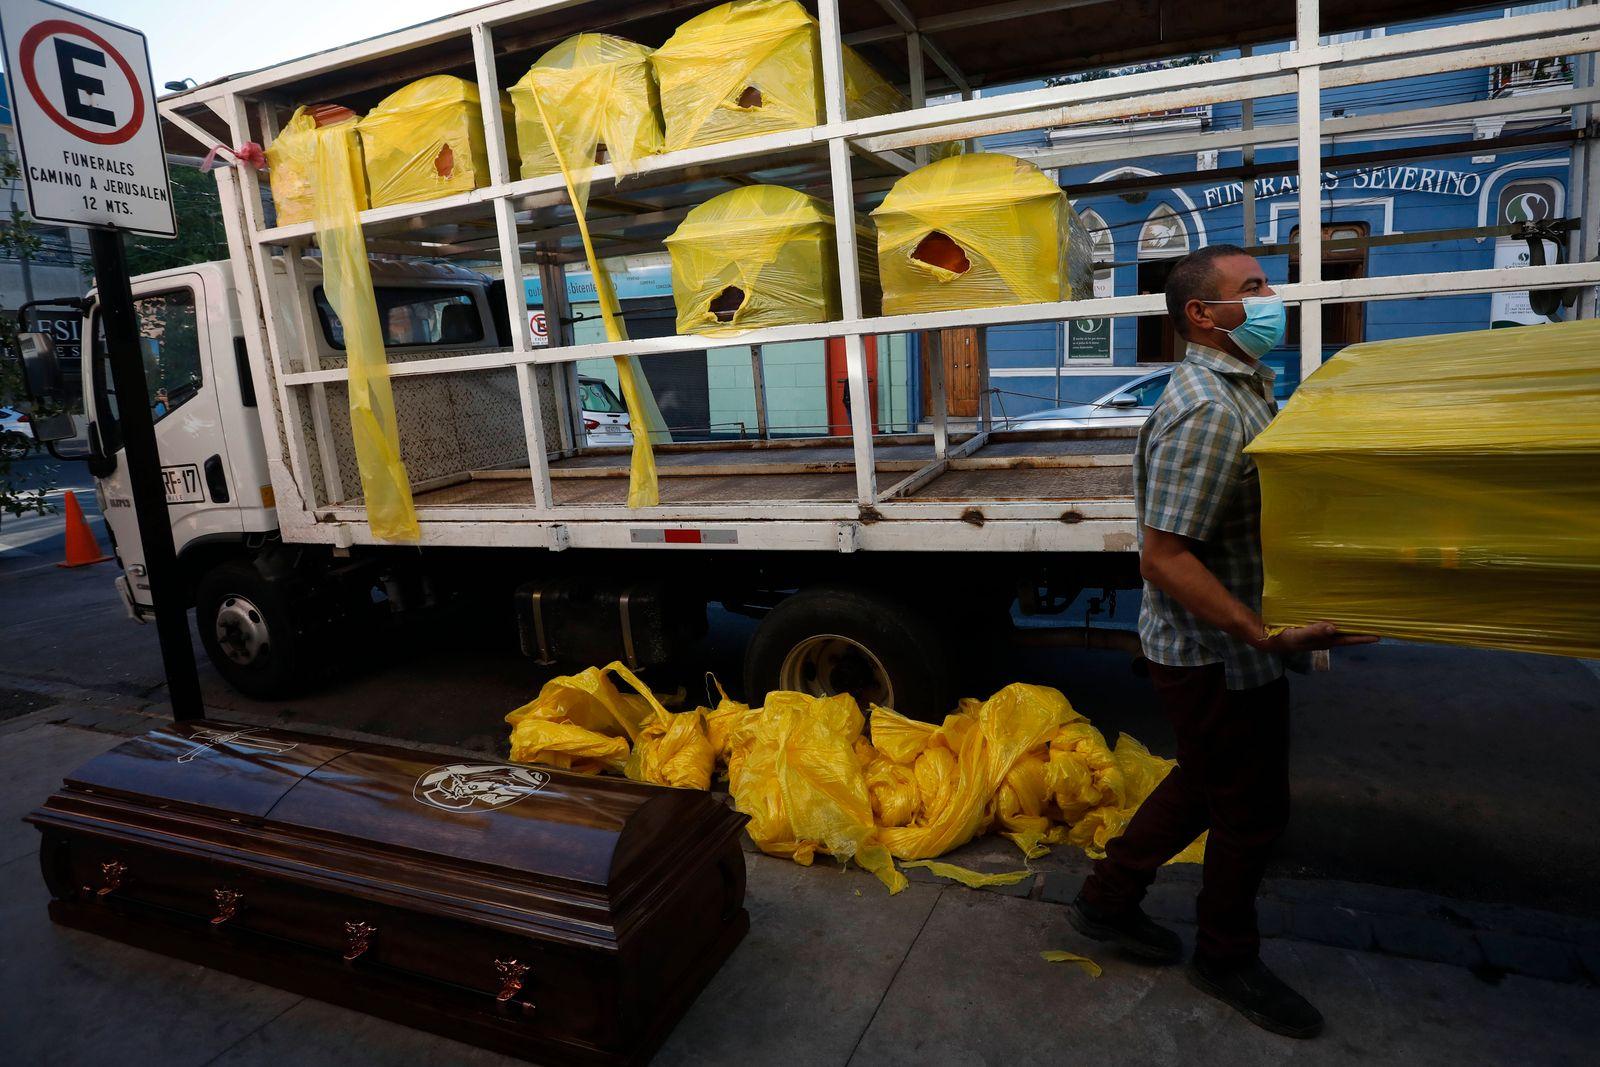 Valparaiso, 7 de abril de 2021. Trabajadores de la funeraria Camino a Jerusalen, cercana al hospital Carlos van Buren, d